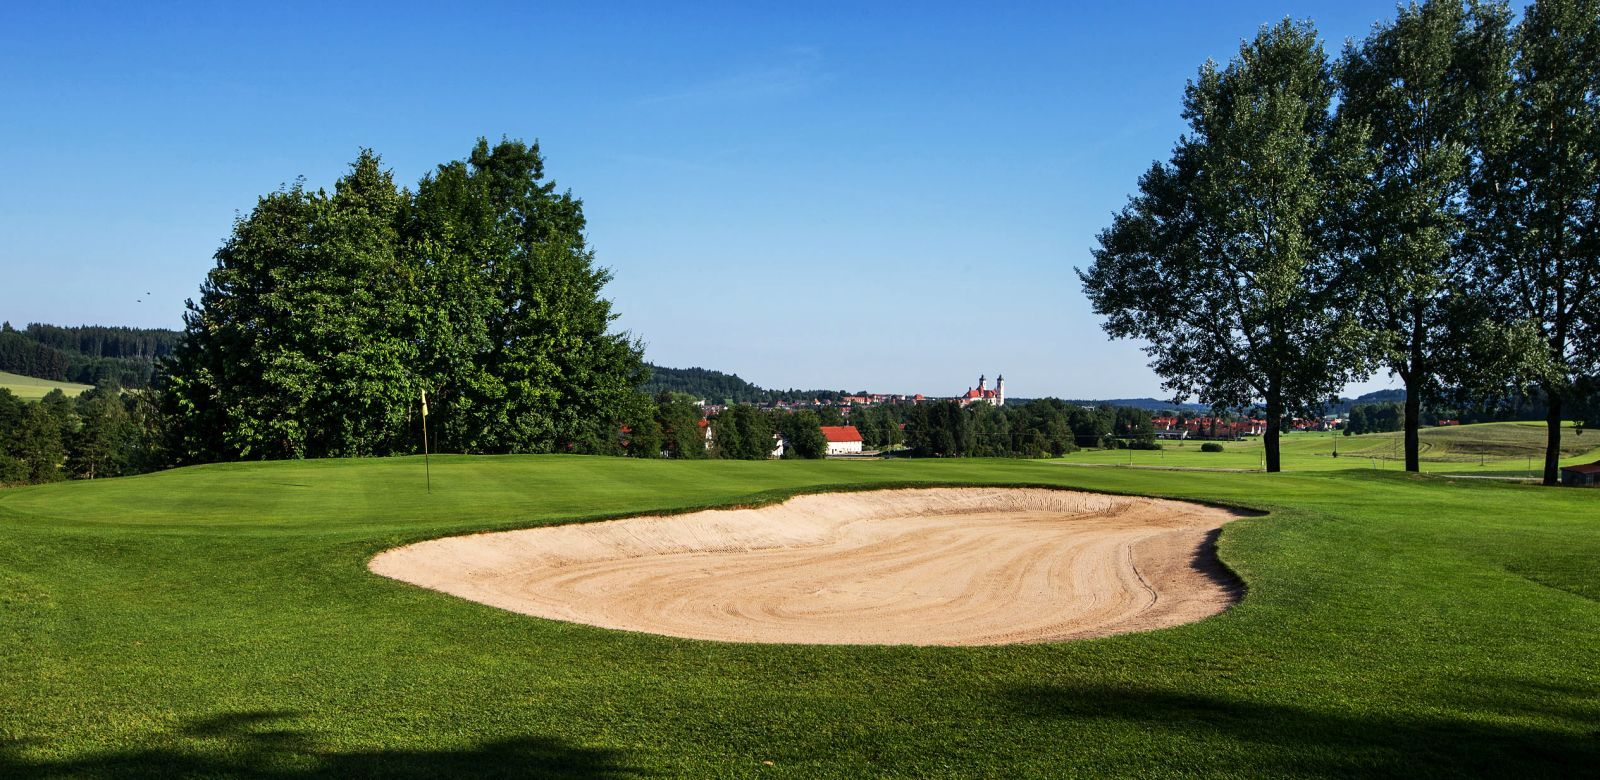 Allg uer golf und landclub cover picture